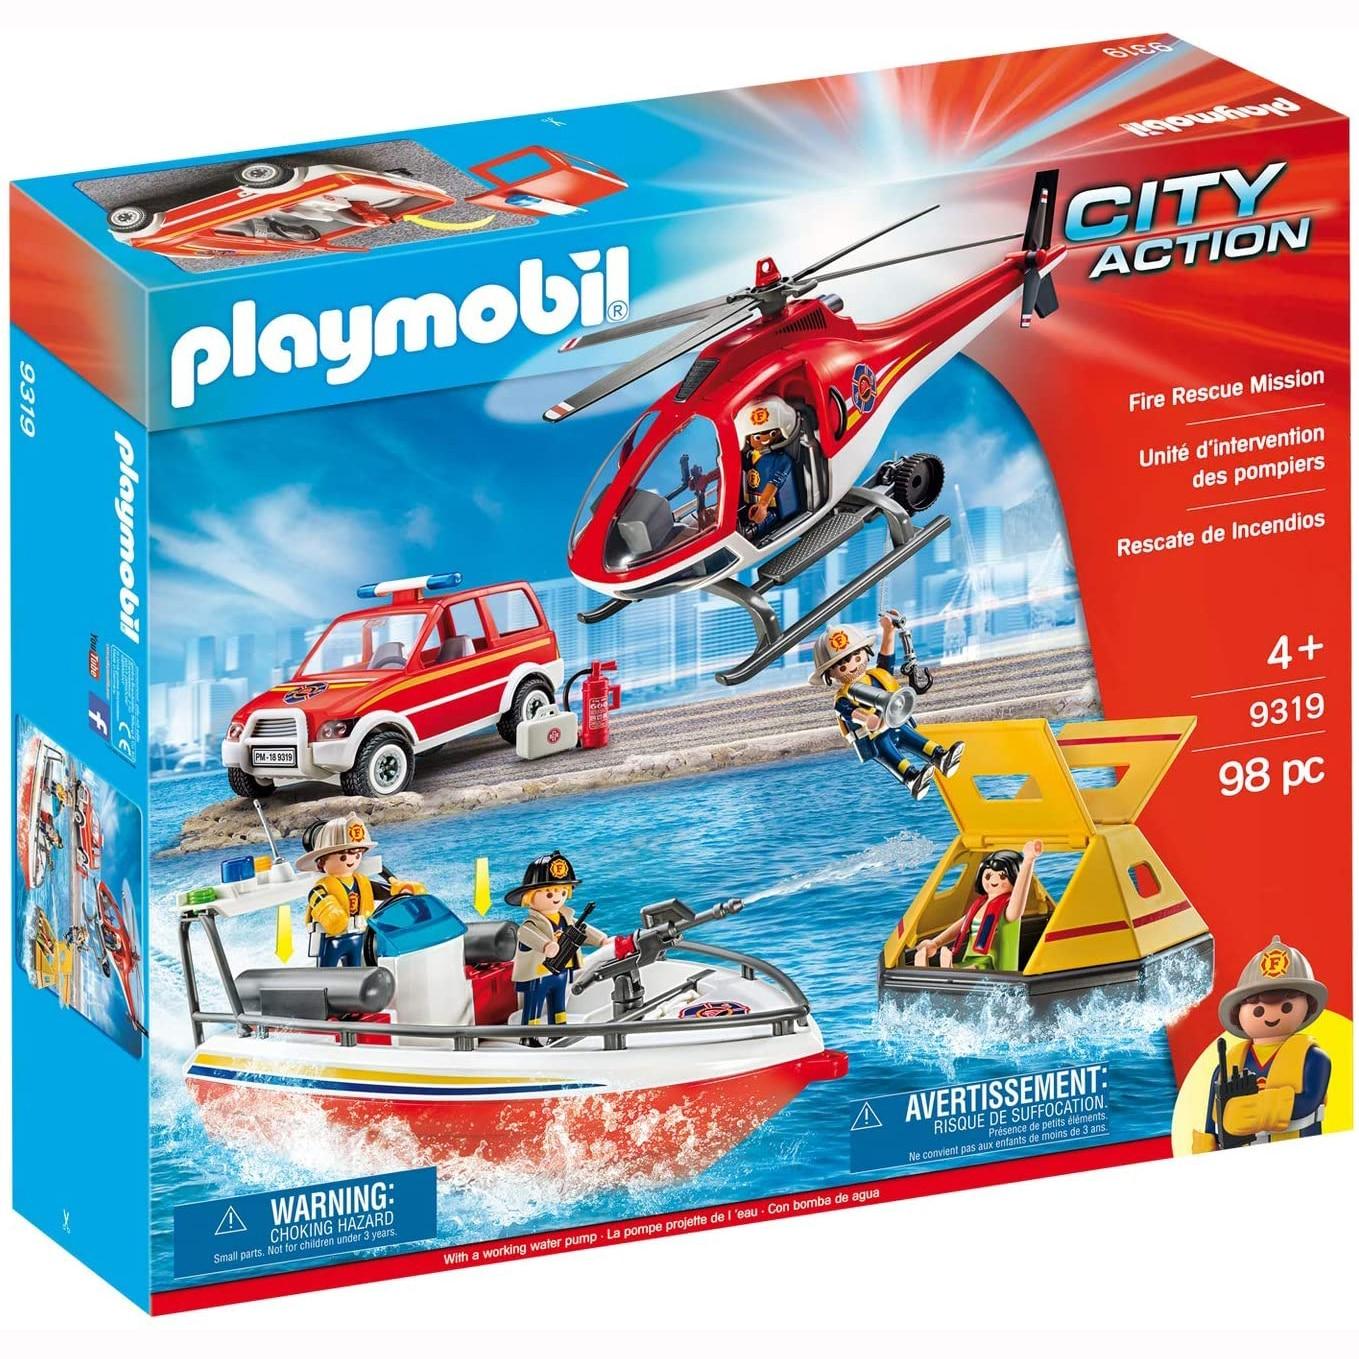 Fotografie Playmobil City Action - Misiunea de salvare a pompierilor